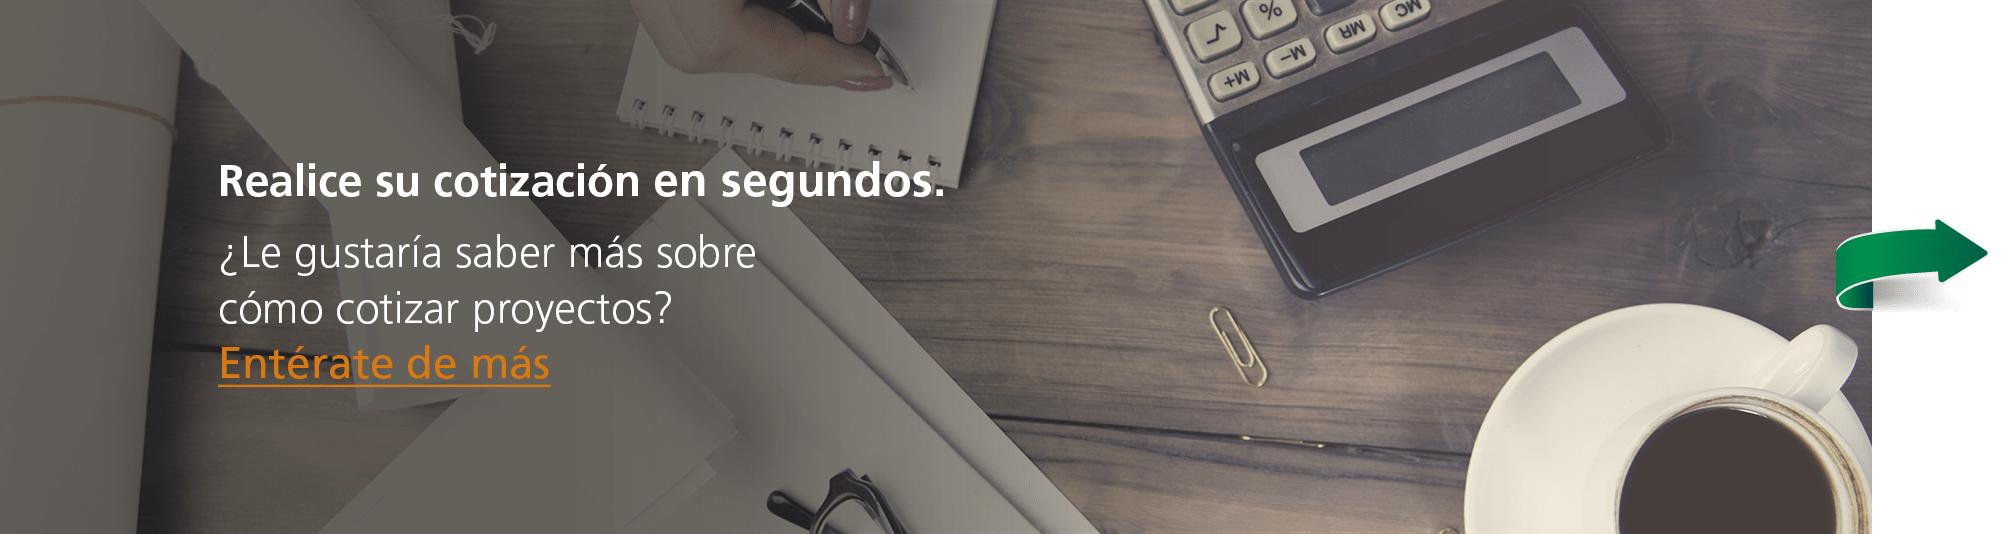 QuickCart Spanish